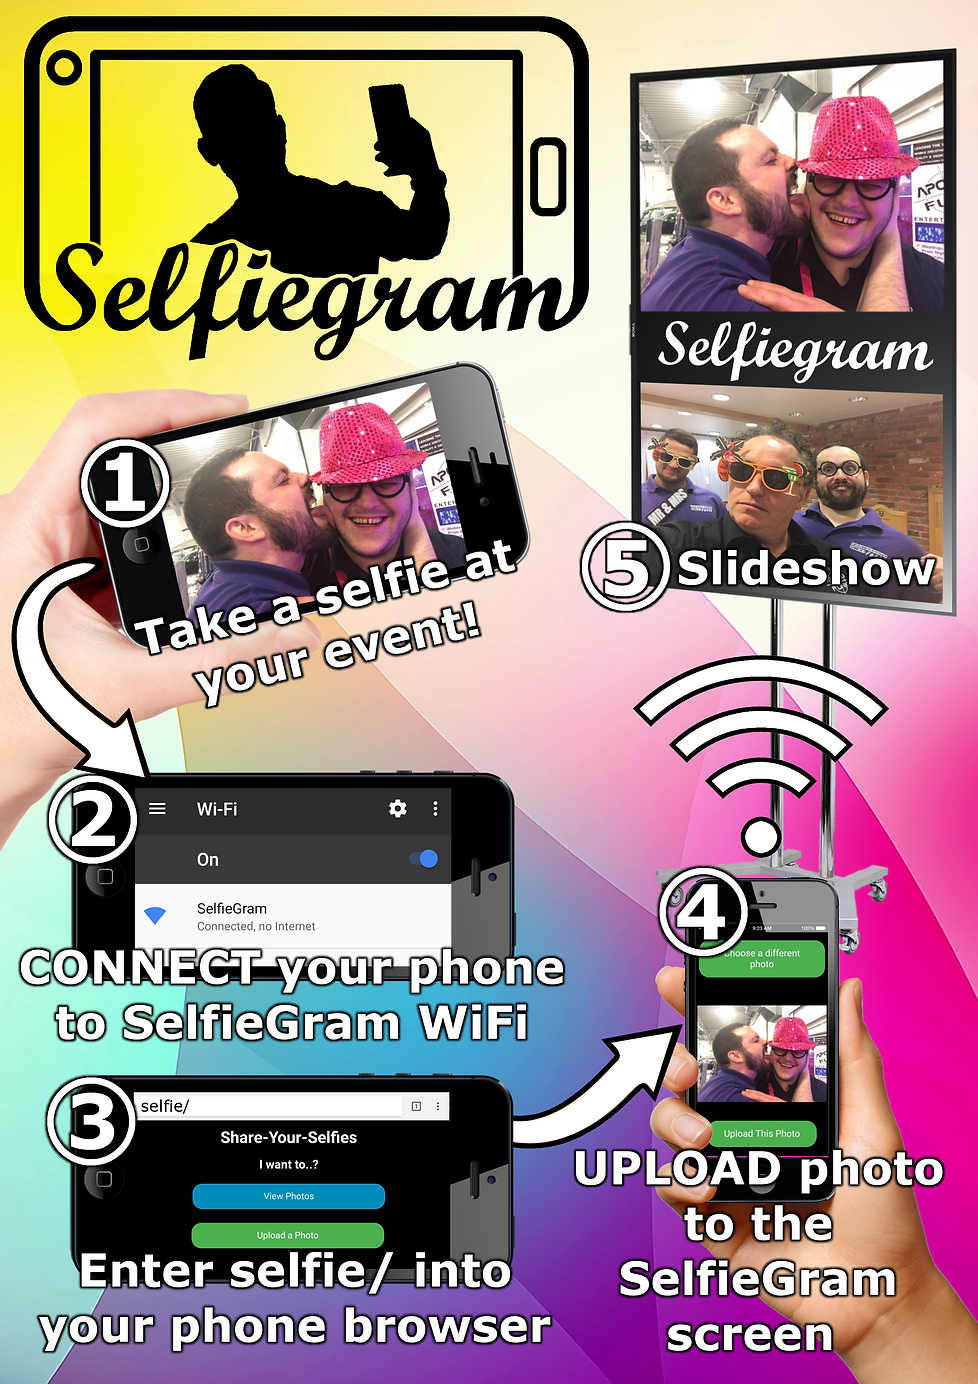 selfiegram